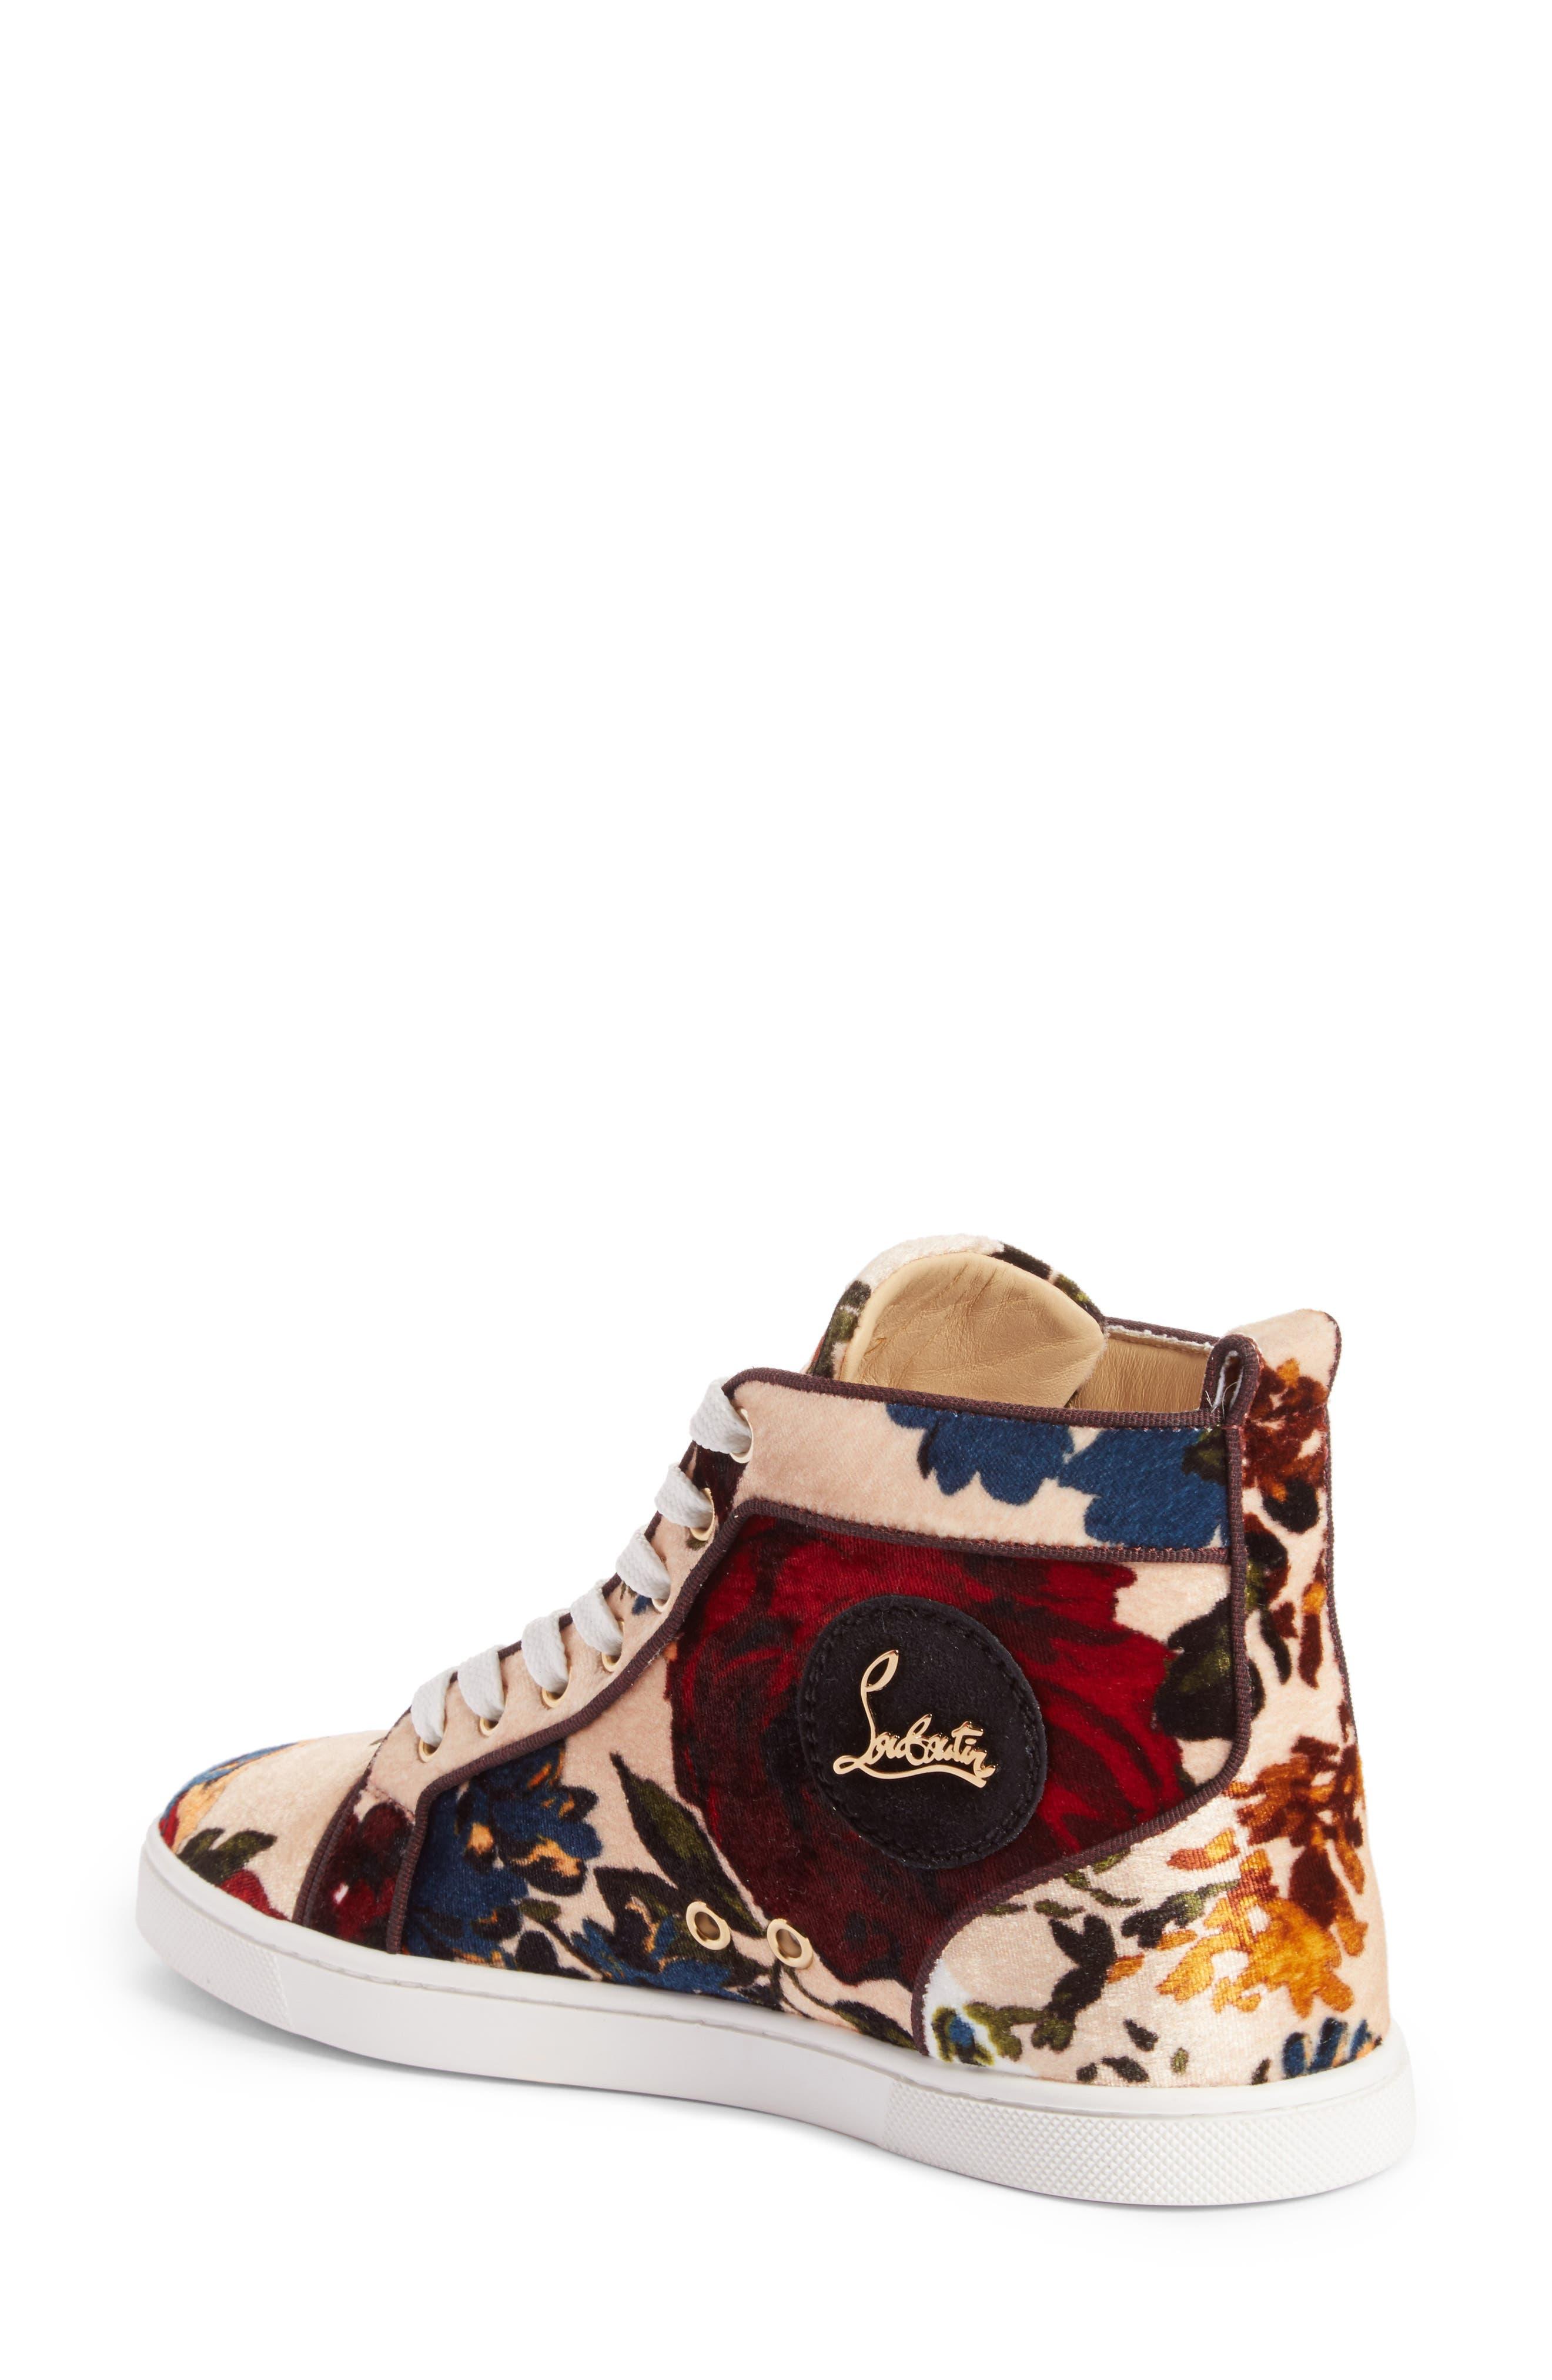 CHRISTIAN LOUBOUTIN,                             Bip Bip Floral Sneaker,                             Alternate thumbnail 2, color,                             250